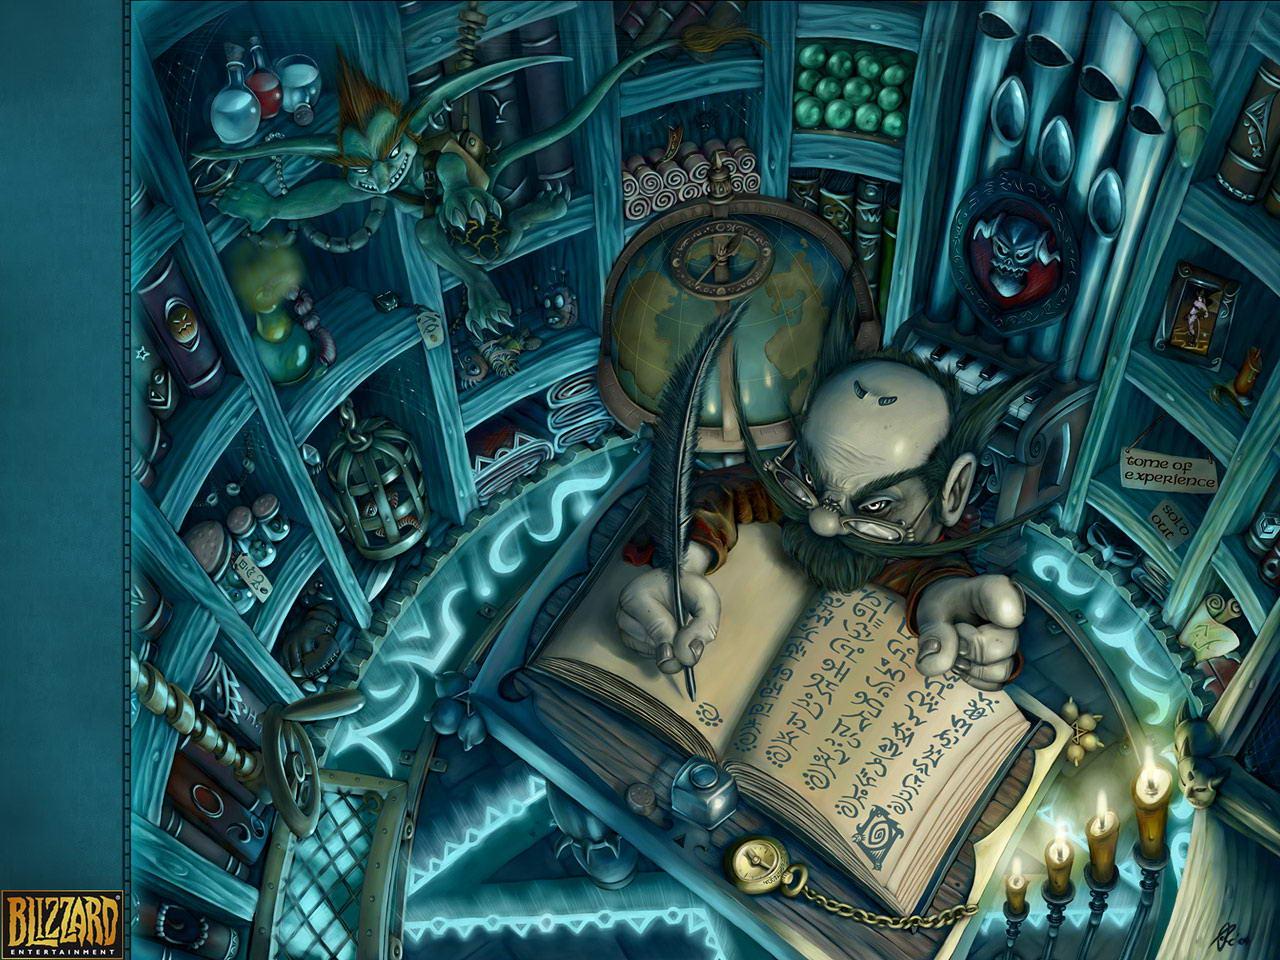 Gnome Warlock Shop   World of Warcraft Wallpaper Gnome Warlock Shop 1280x960